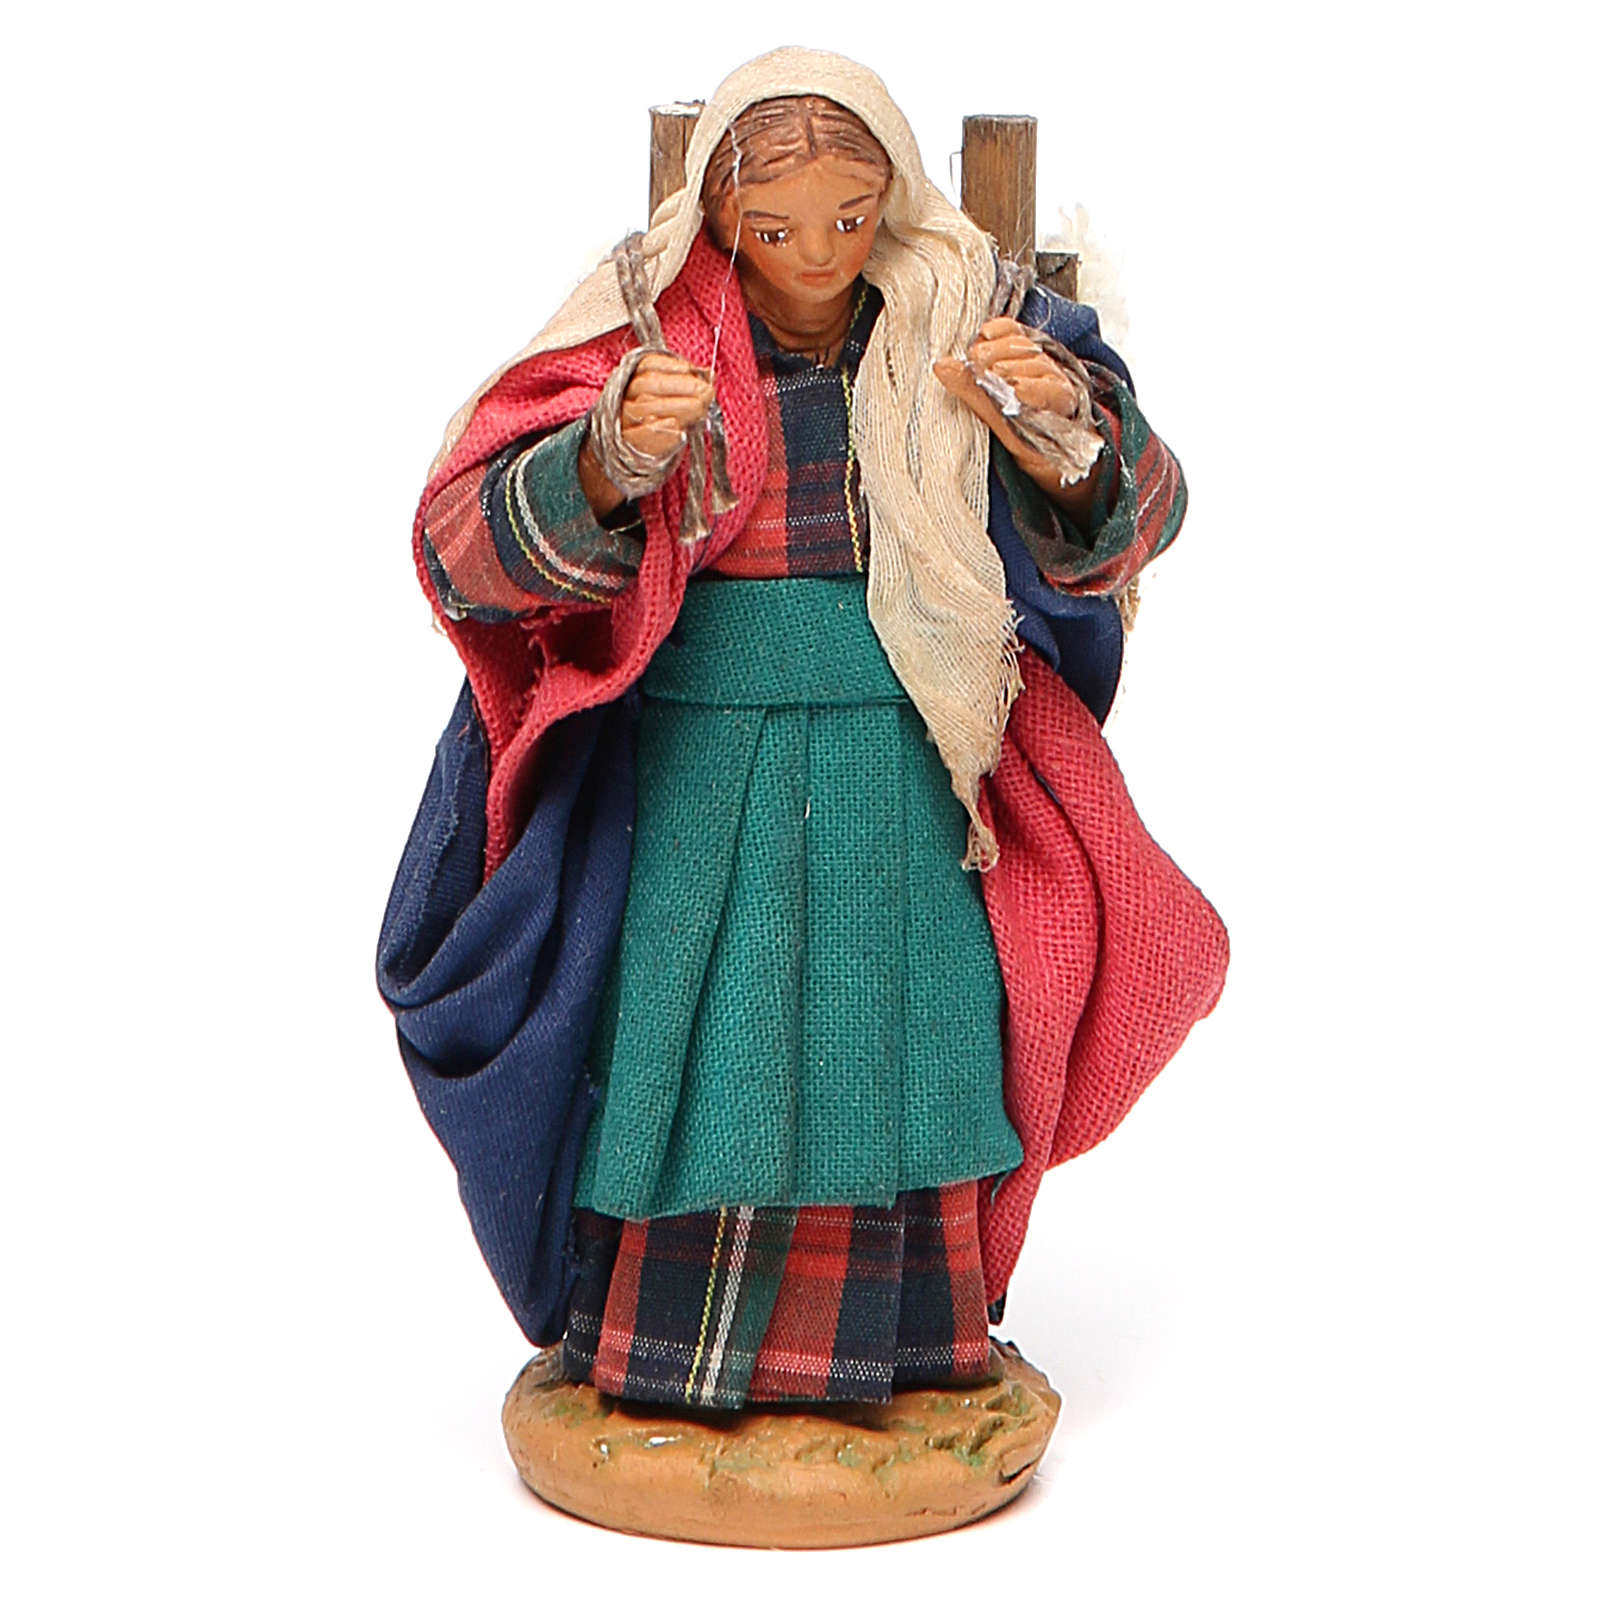 Woman carrying fabric, Neapolitan nativity figurine 10cm 4